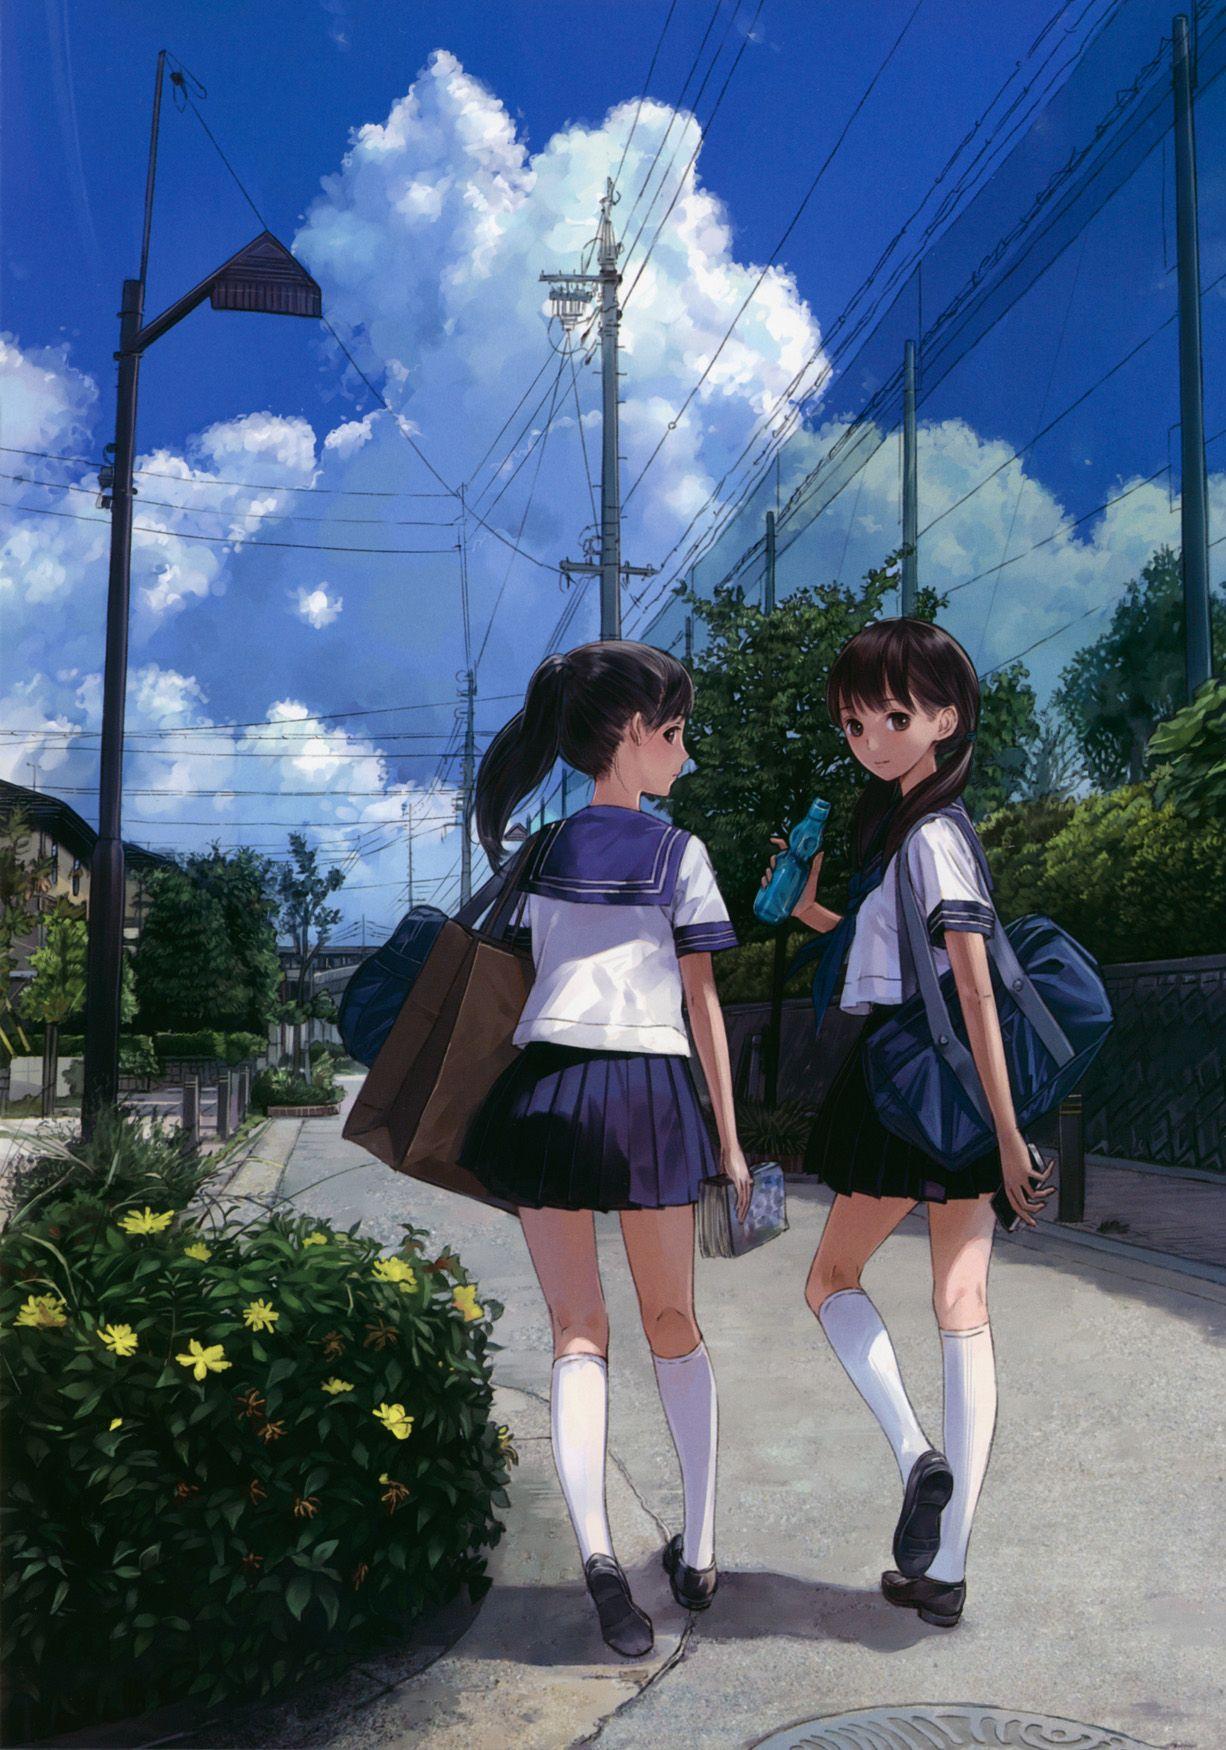 Pin by chen on illustration Anime school girl, Anime art